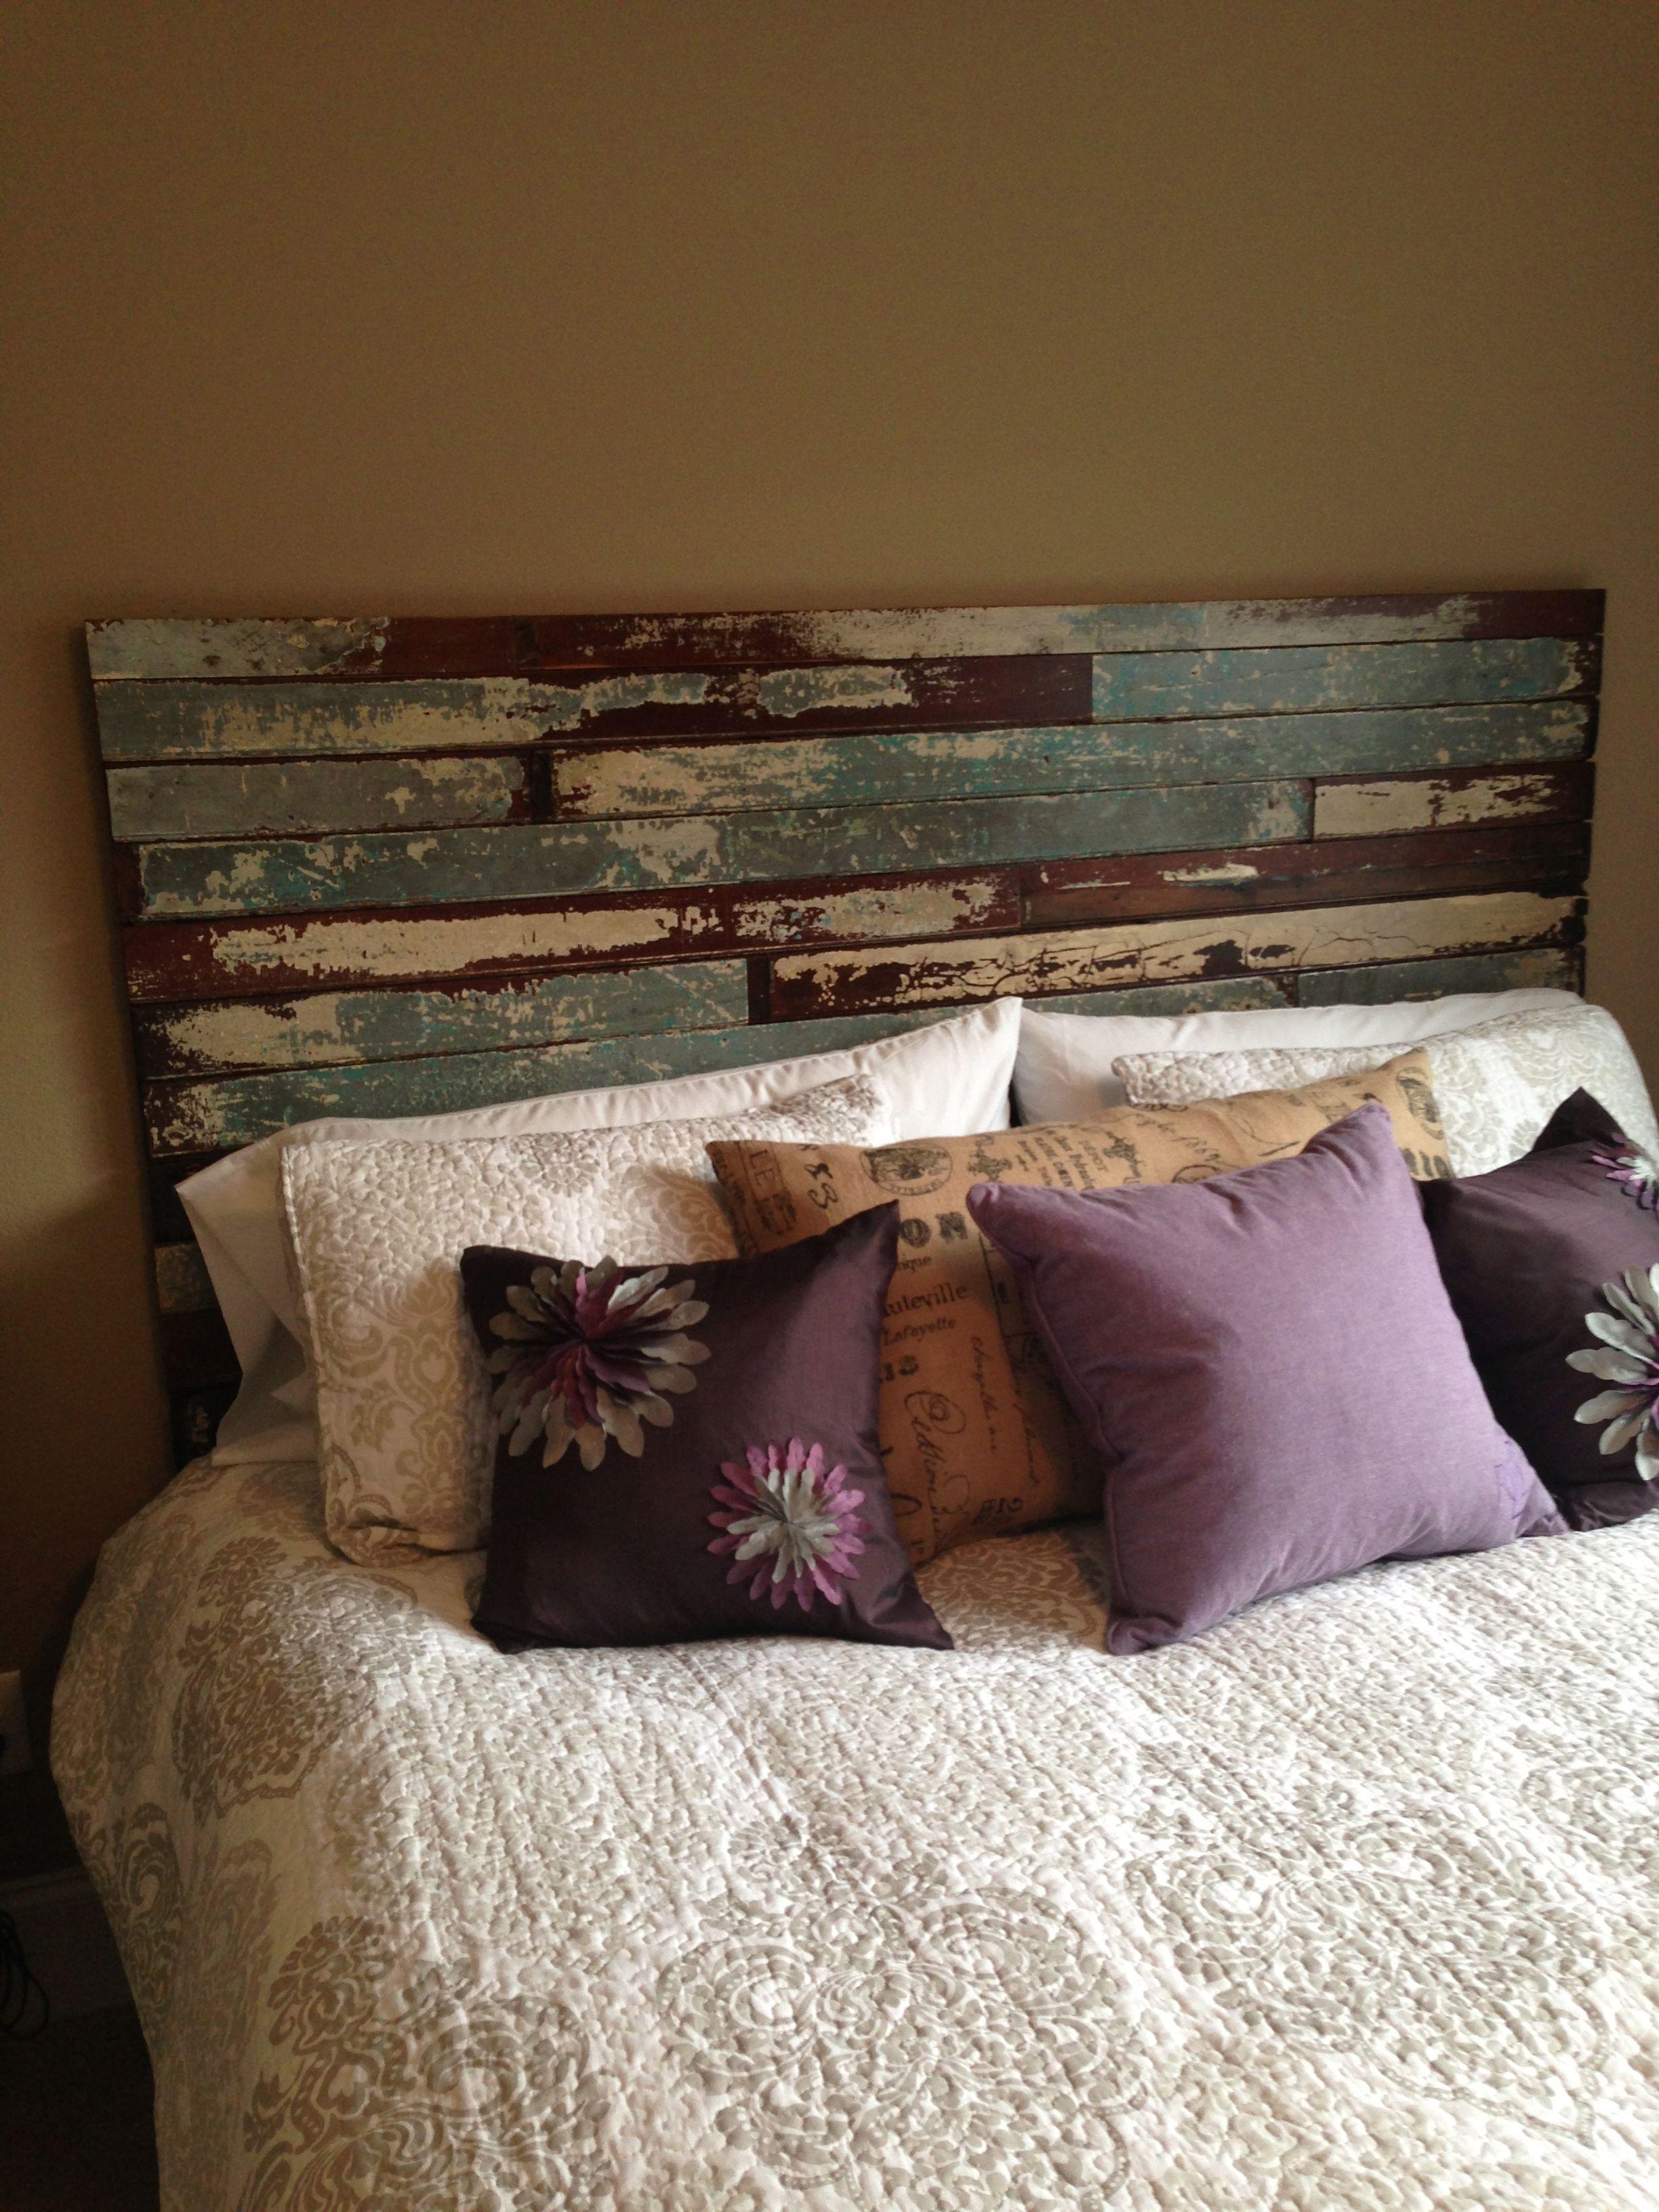 Superior Reclaimed Wood Makes A Great King Size Headboard. Kopfbrett Alternative Hausgemachten ... Awesome Ideas